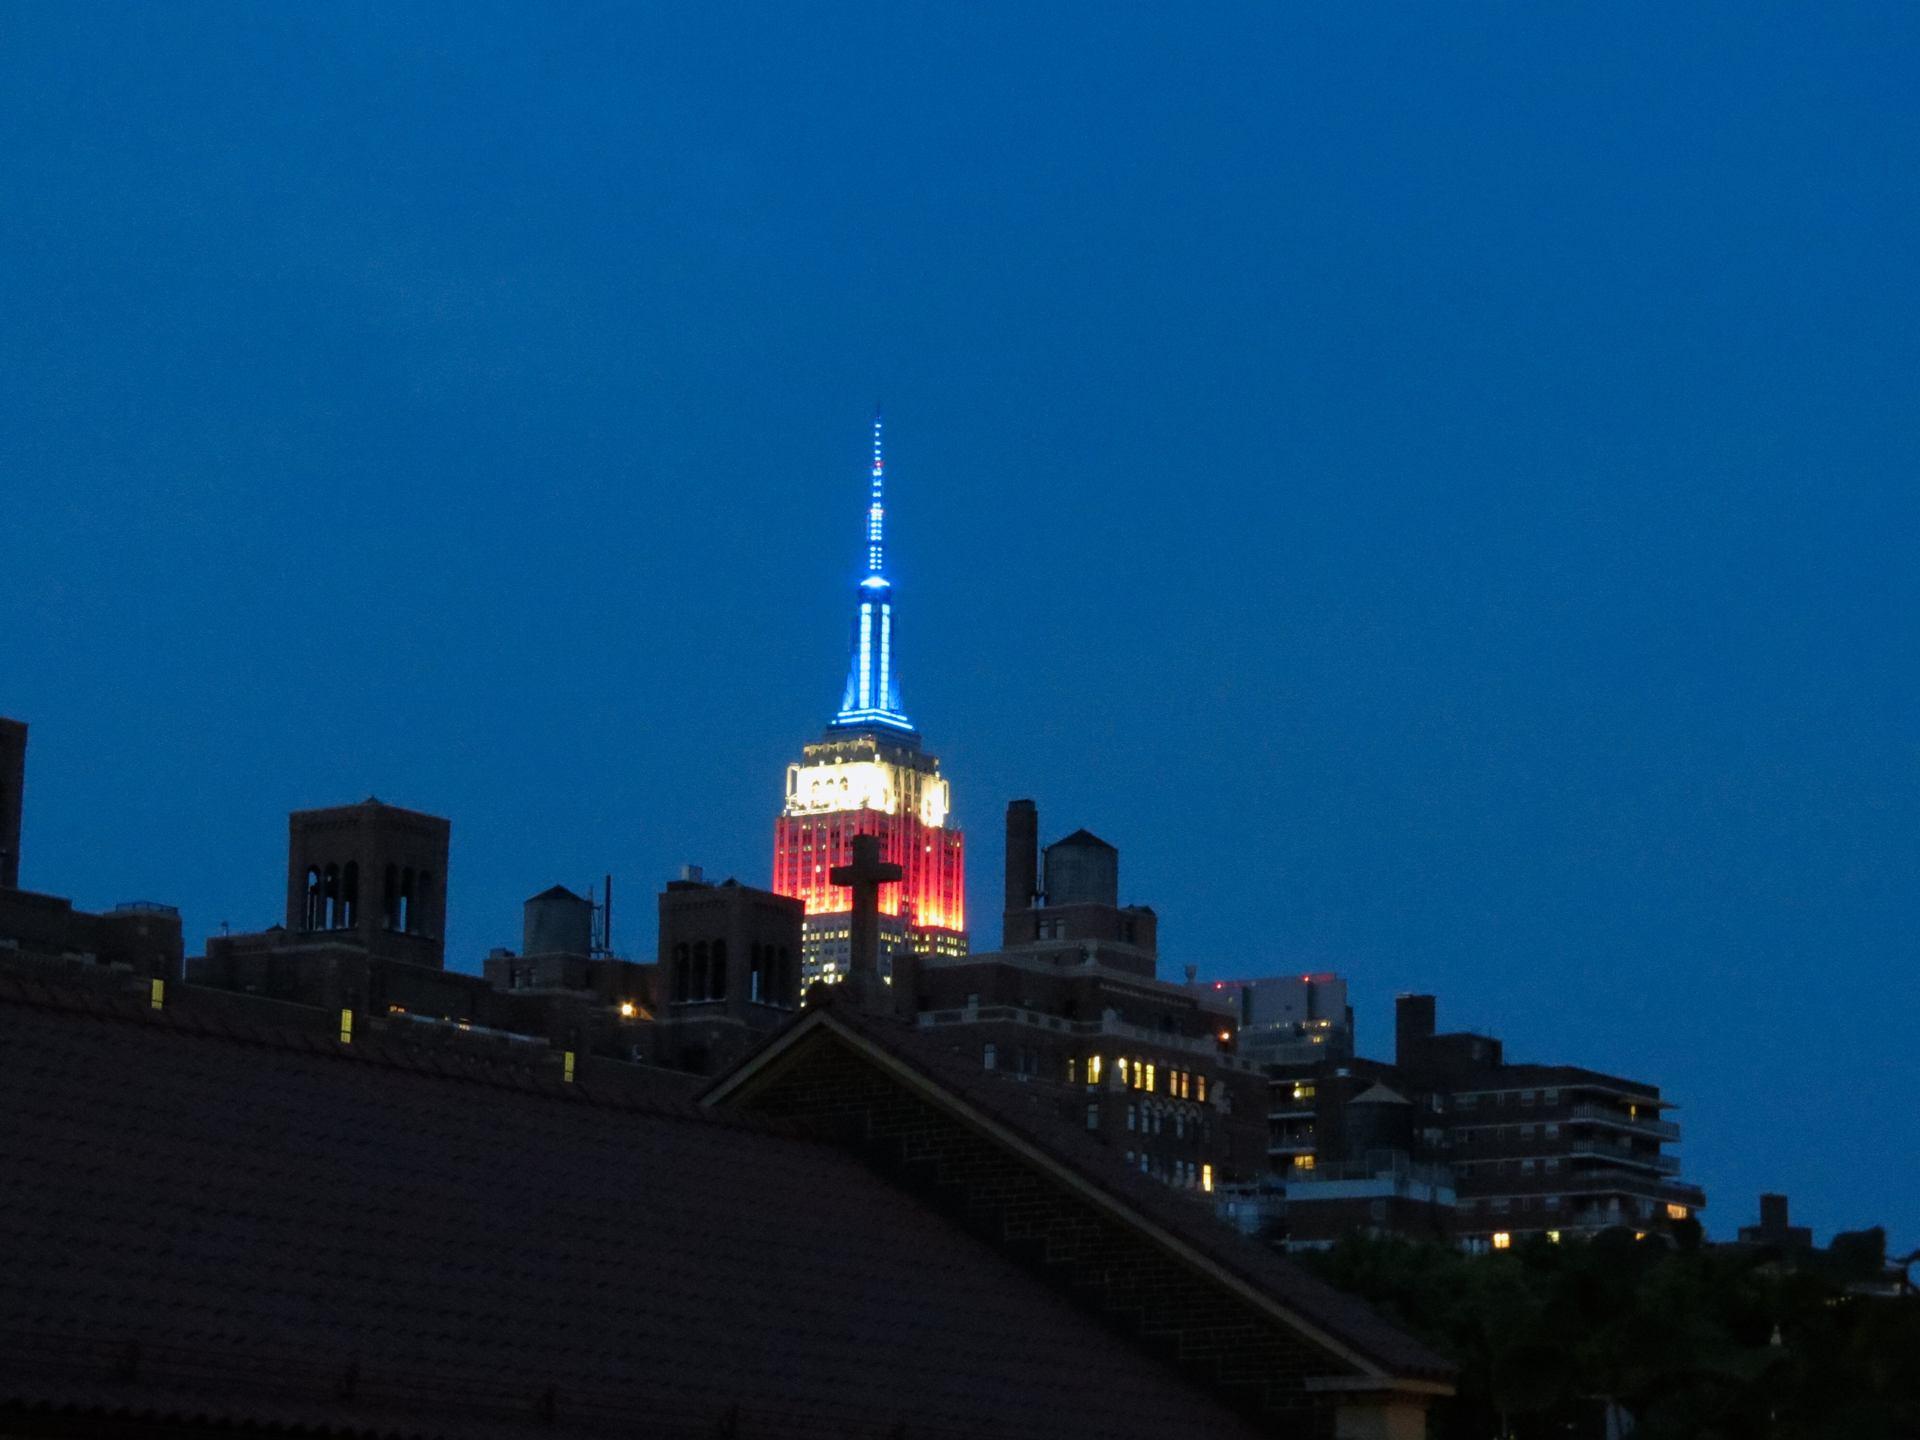 Toits et Empire State Building